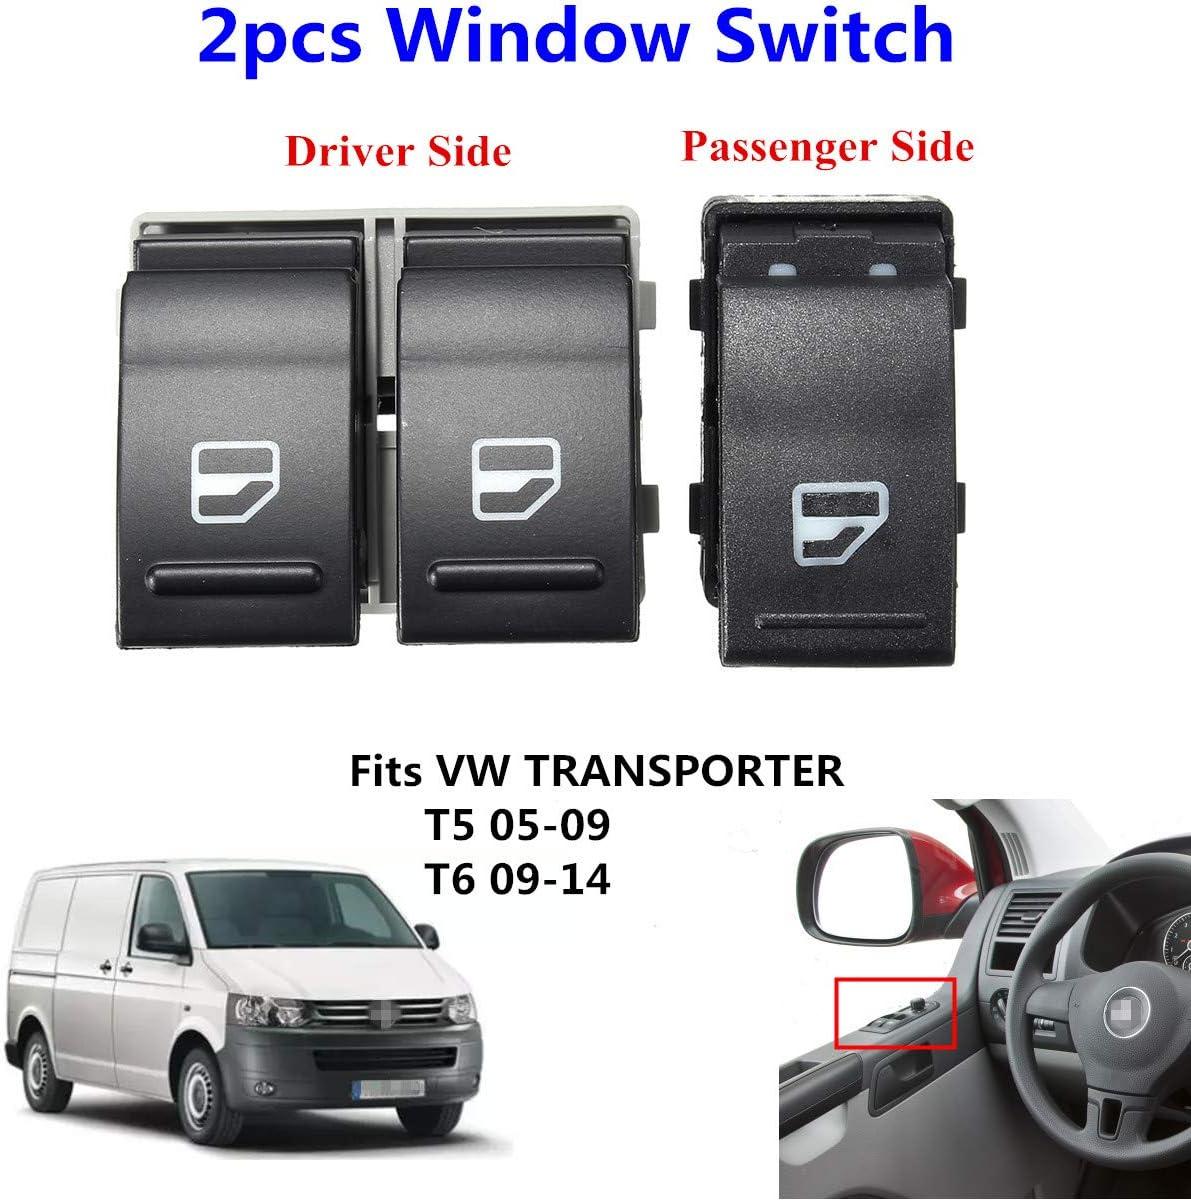 2pcs Electric Window Regulator Driver Passenger Side Switch for Transporter T5 T6 7E0959855A 7E0959855